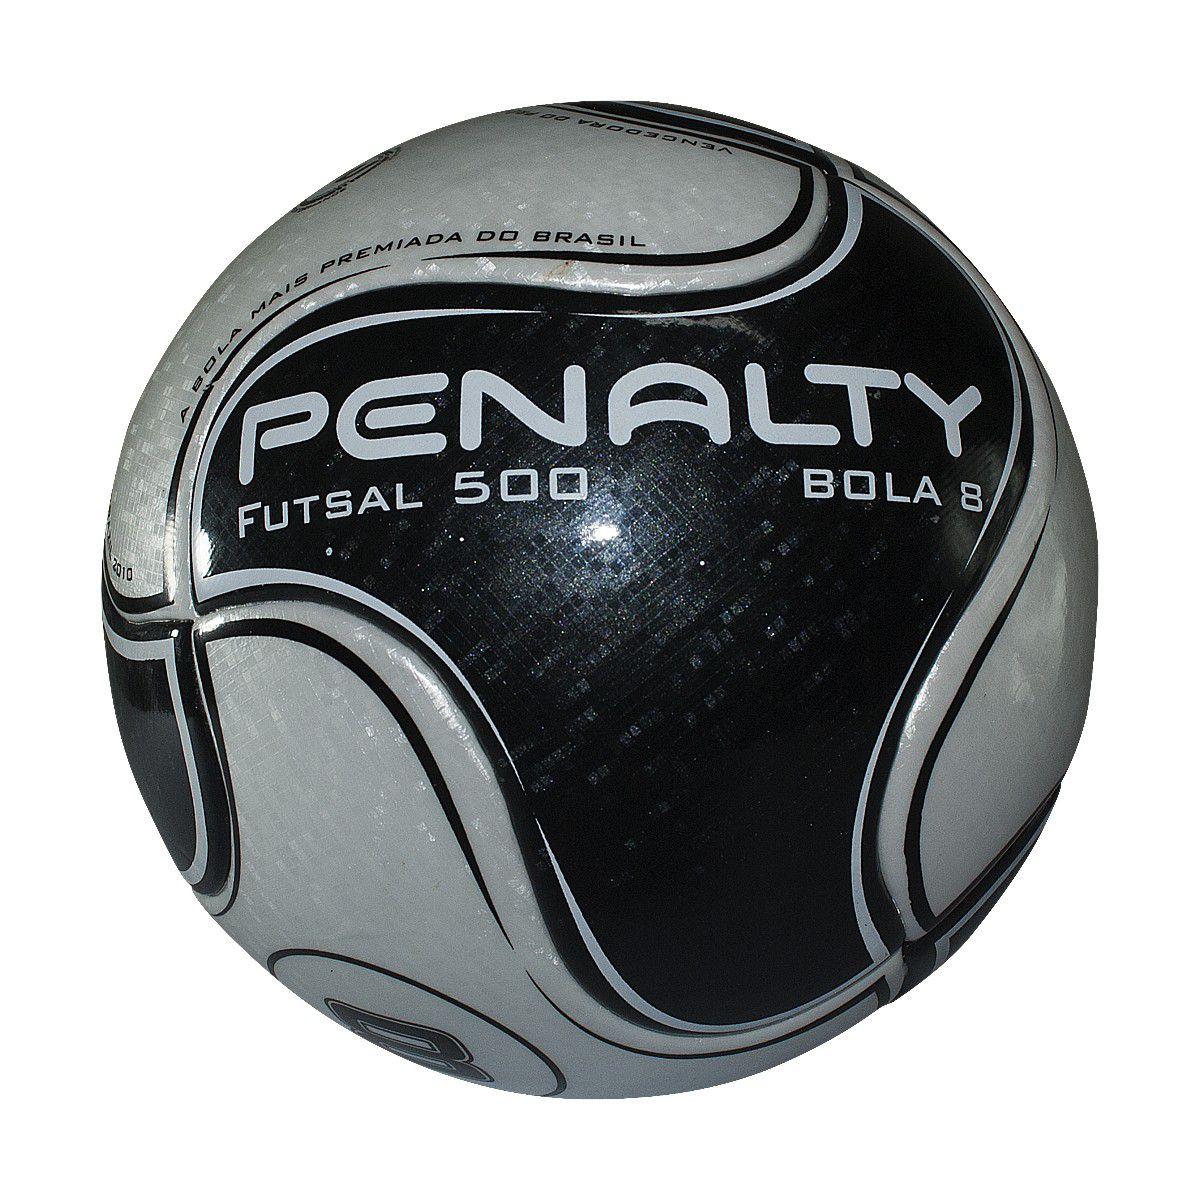 b44a8270c Bola Futsal Penalty Futsal 500 8 IX - Branco Preto - Joinville ...